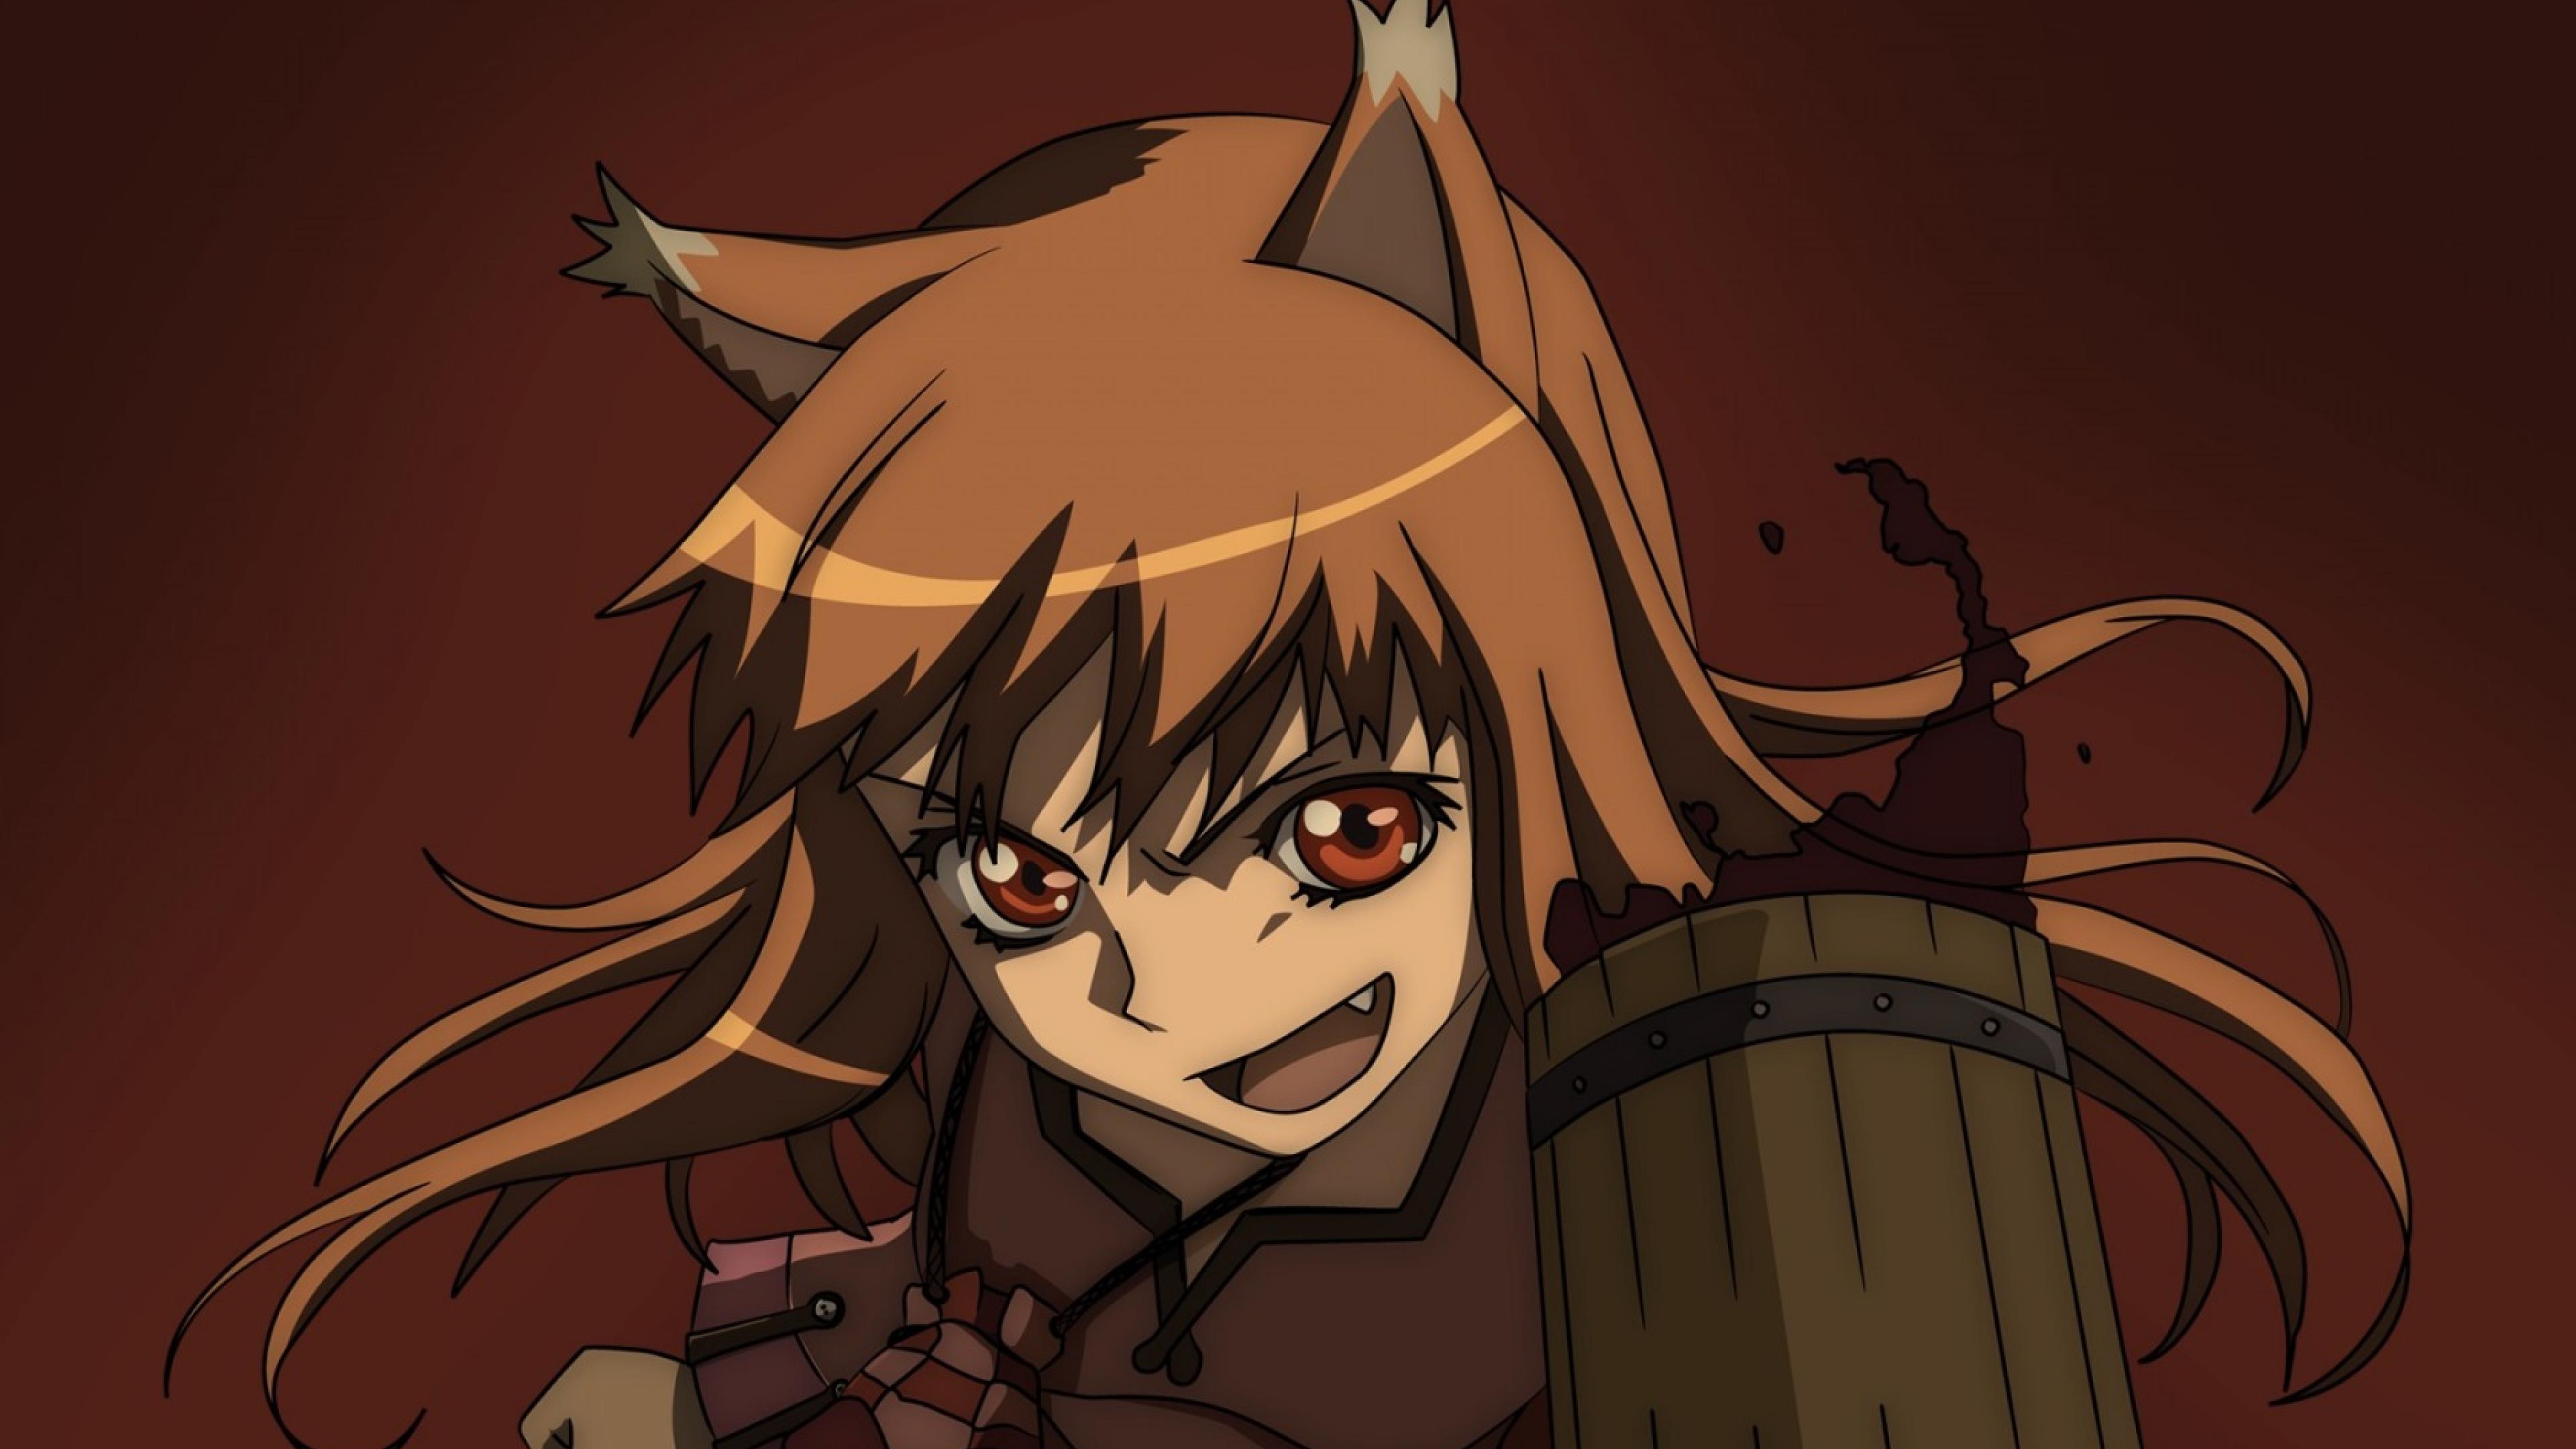 3840x2160 Spice And Wolf Girl Fox 4k Wallpaper Hd Anime 4k